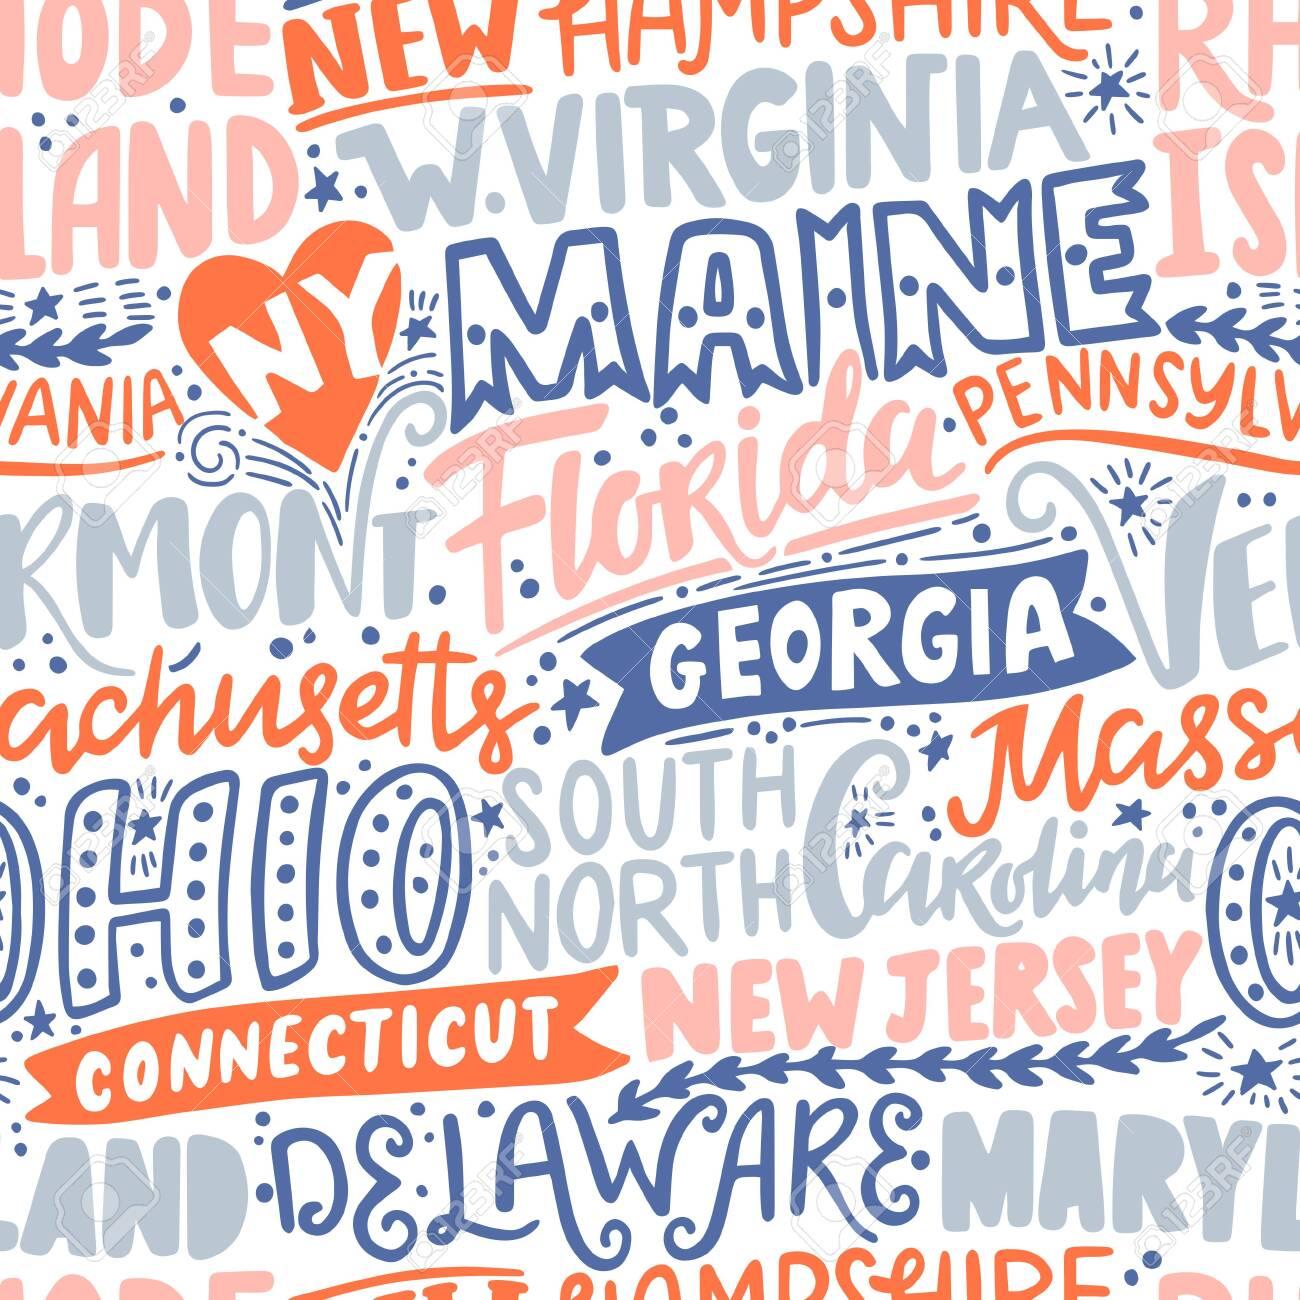 Vector seamless pattern with USA states. New York, Maine, Florida, Georgia, Vermont, Massachusetts, Ohio, Carolina, New Jersey, Connecticut, Maryland, Delaware, Virginia, Rhode Island, Pennsylvania - 151065123